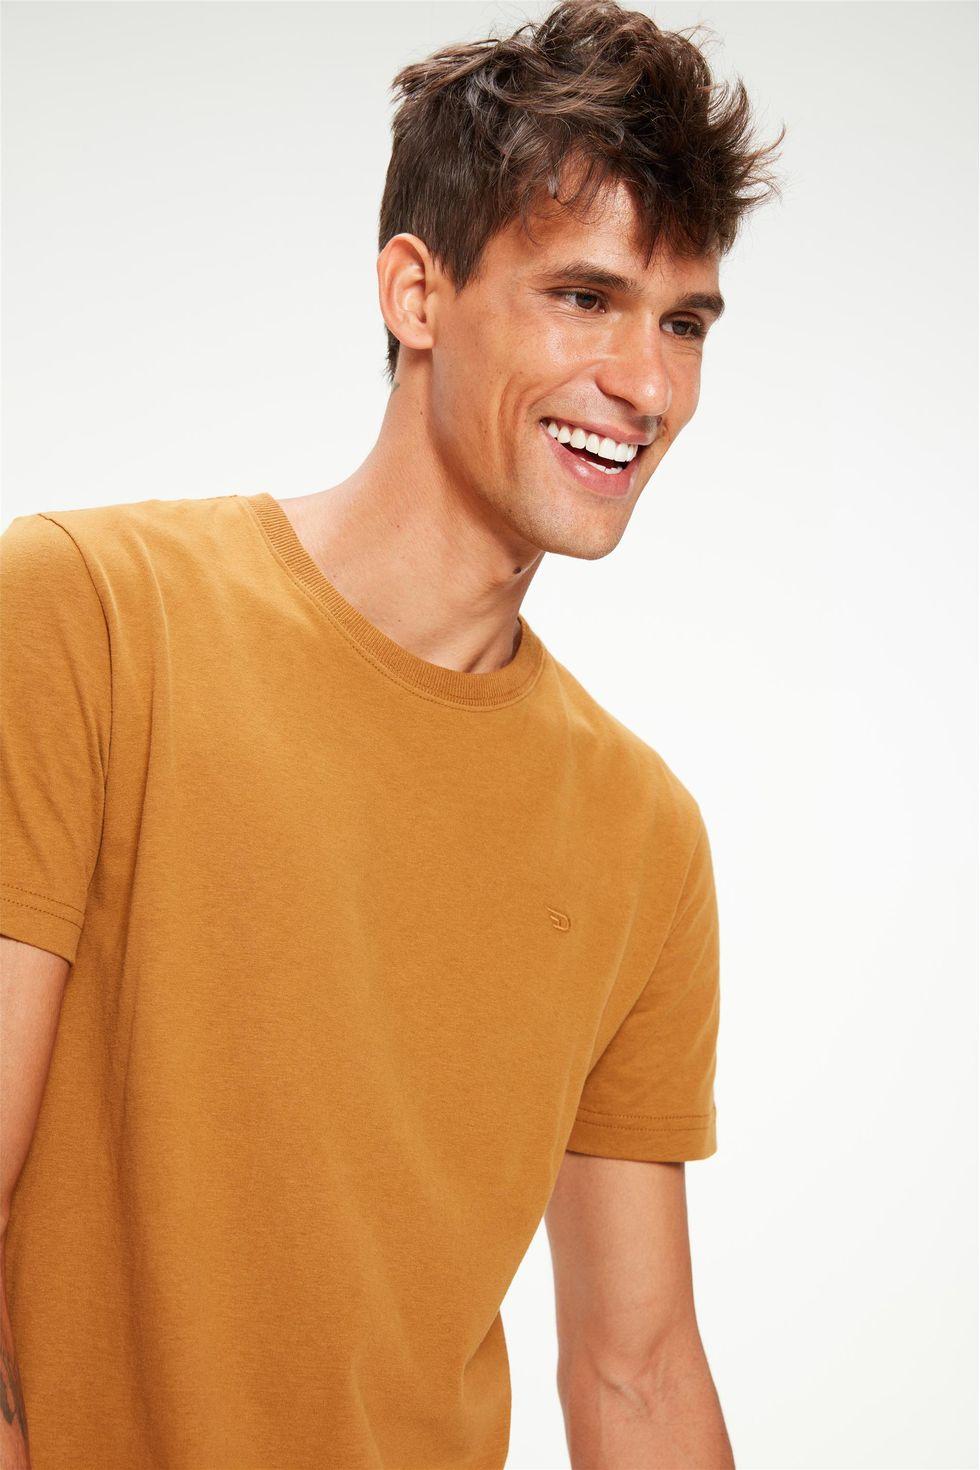 Camiseta-Basica-Lisa-Masculina-Frente--